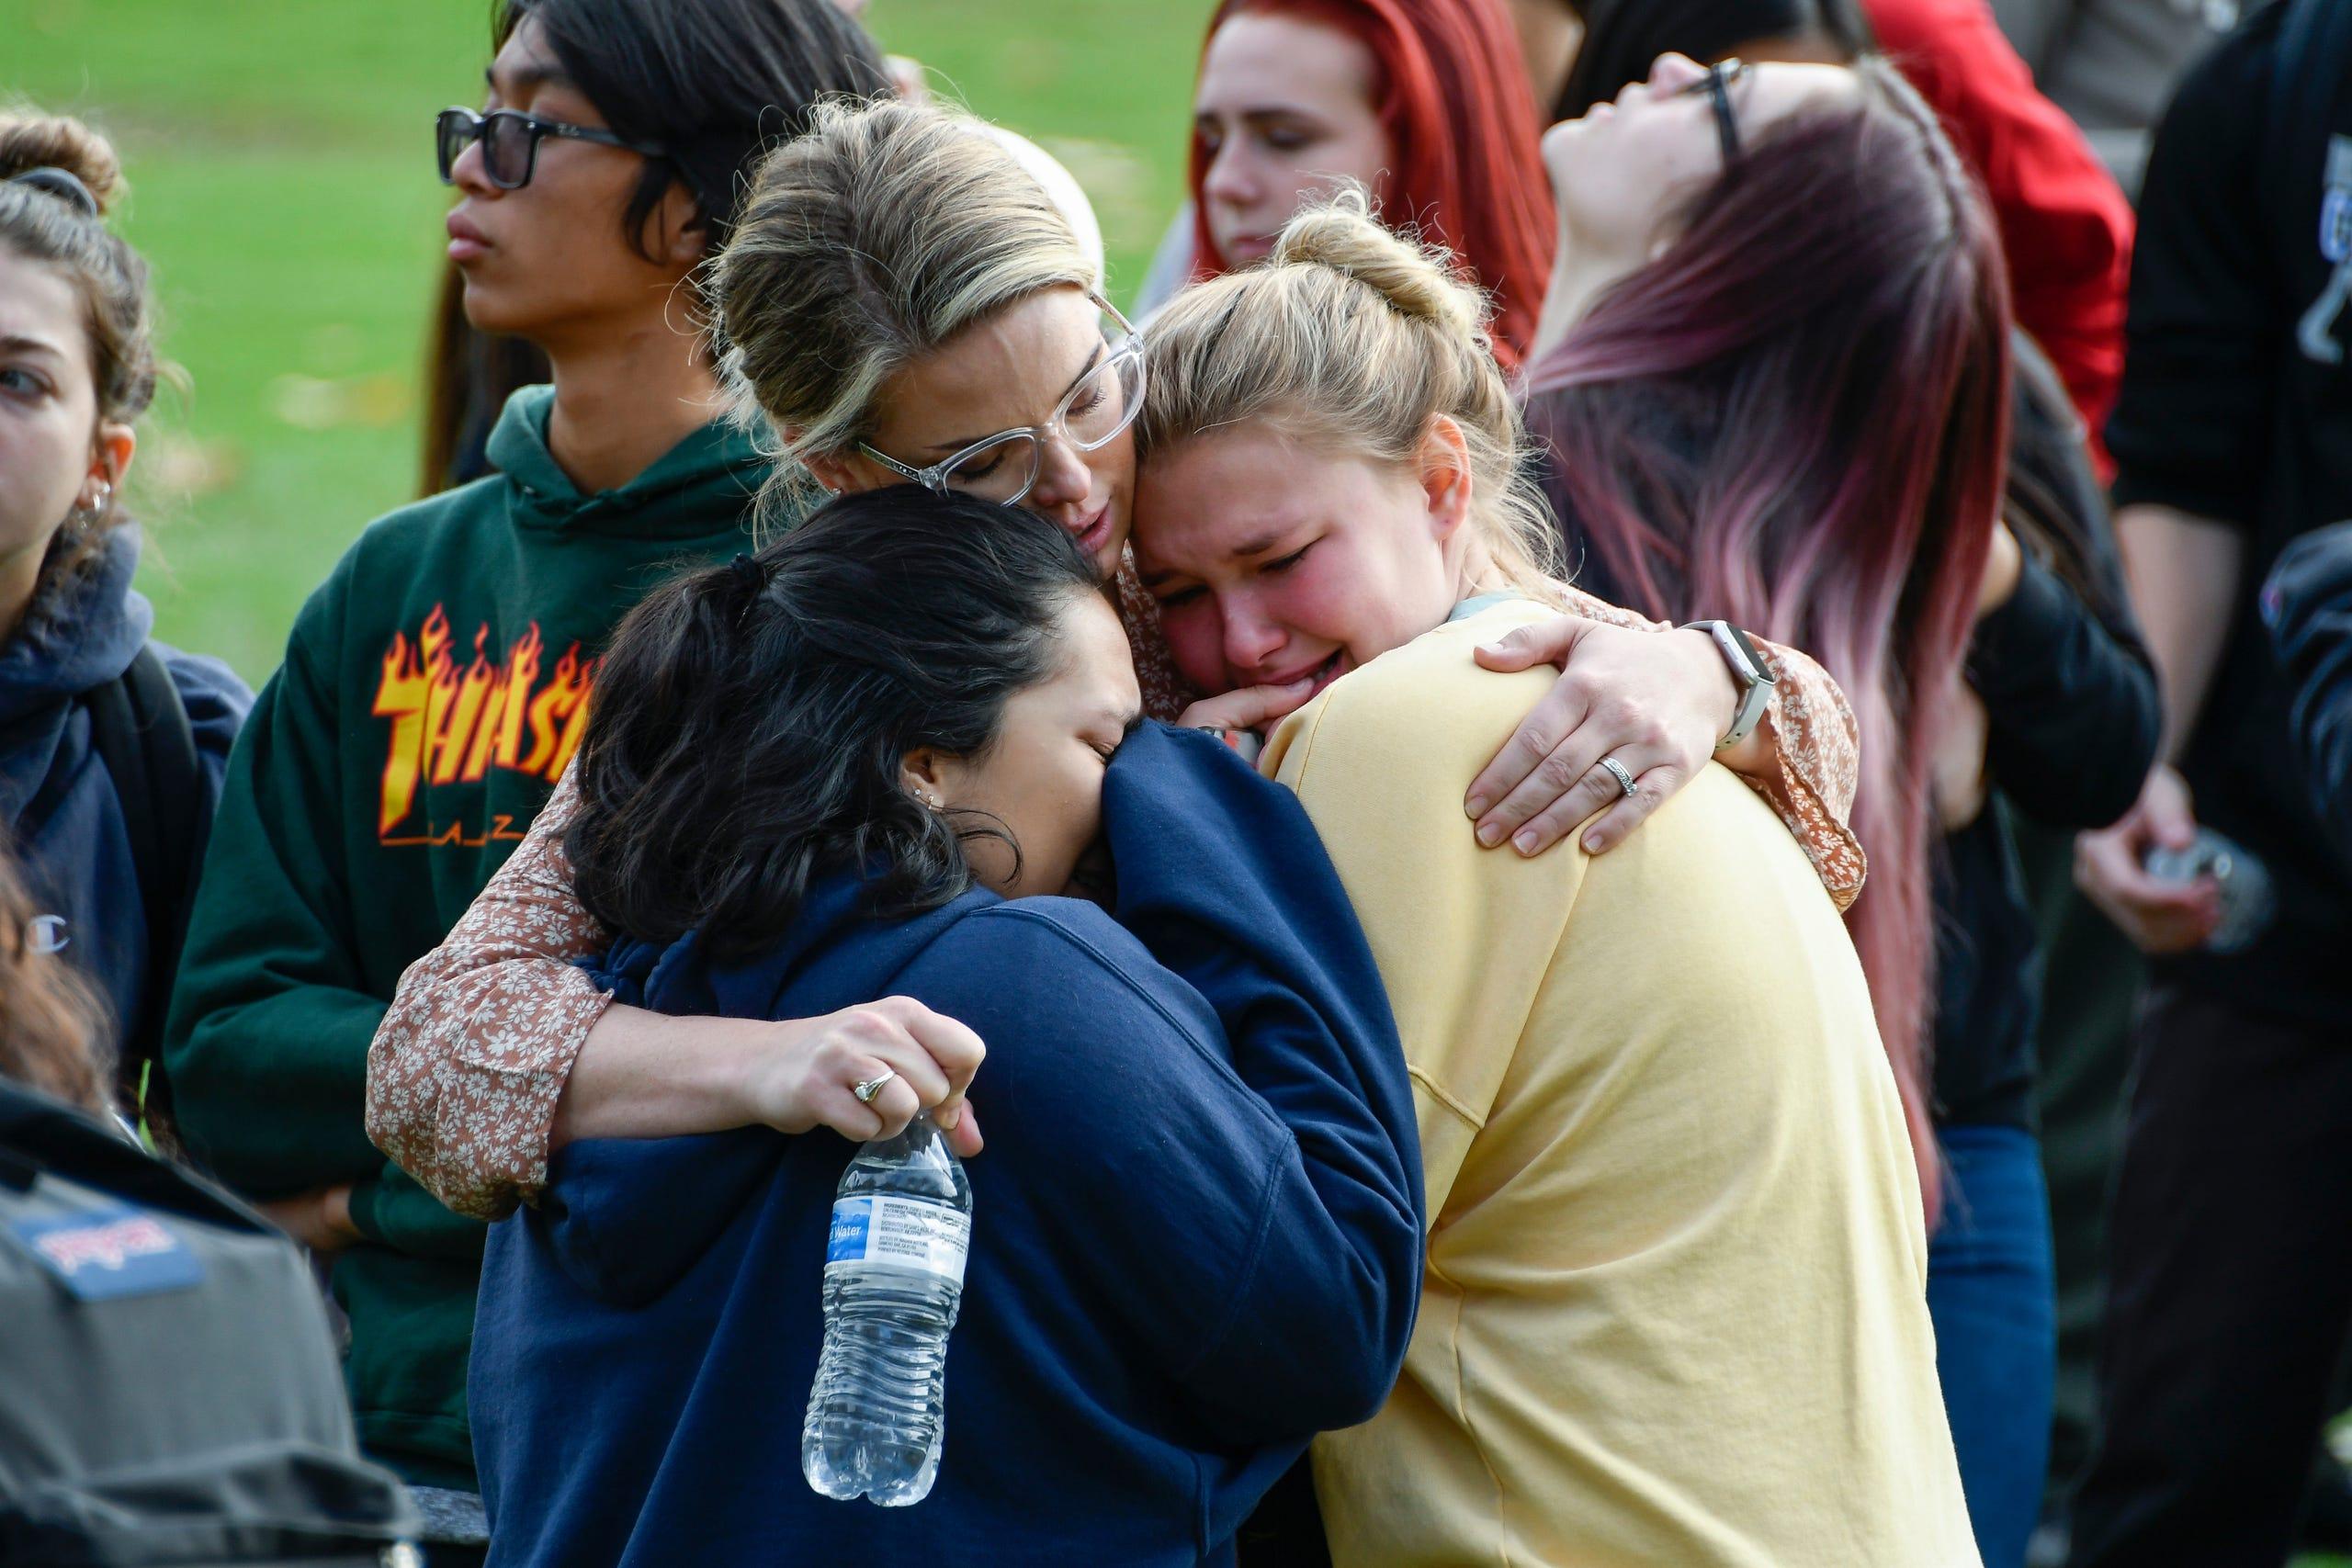 santa clarita ca school shooting